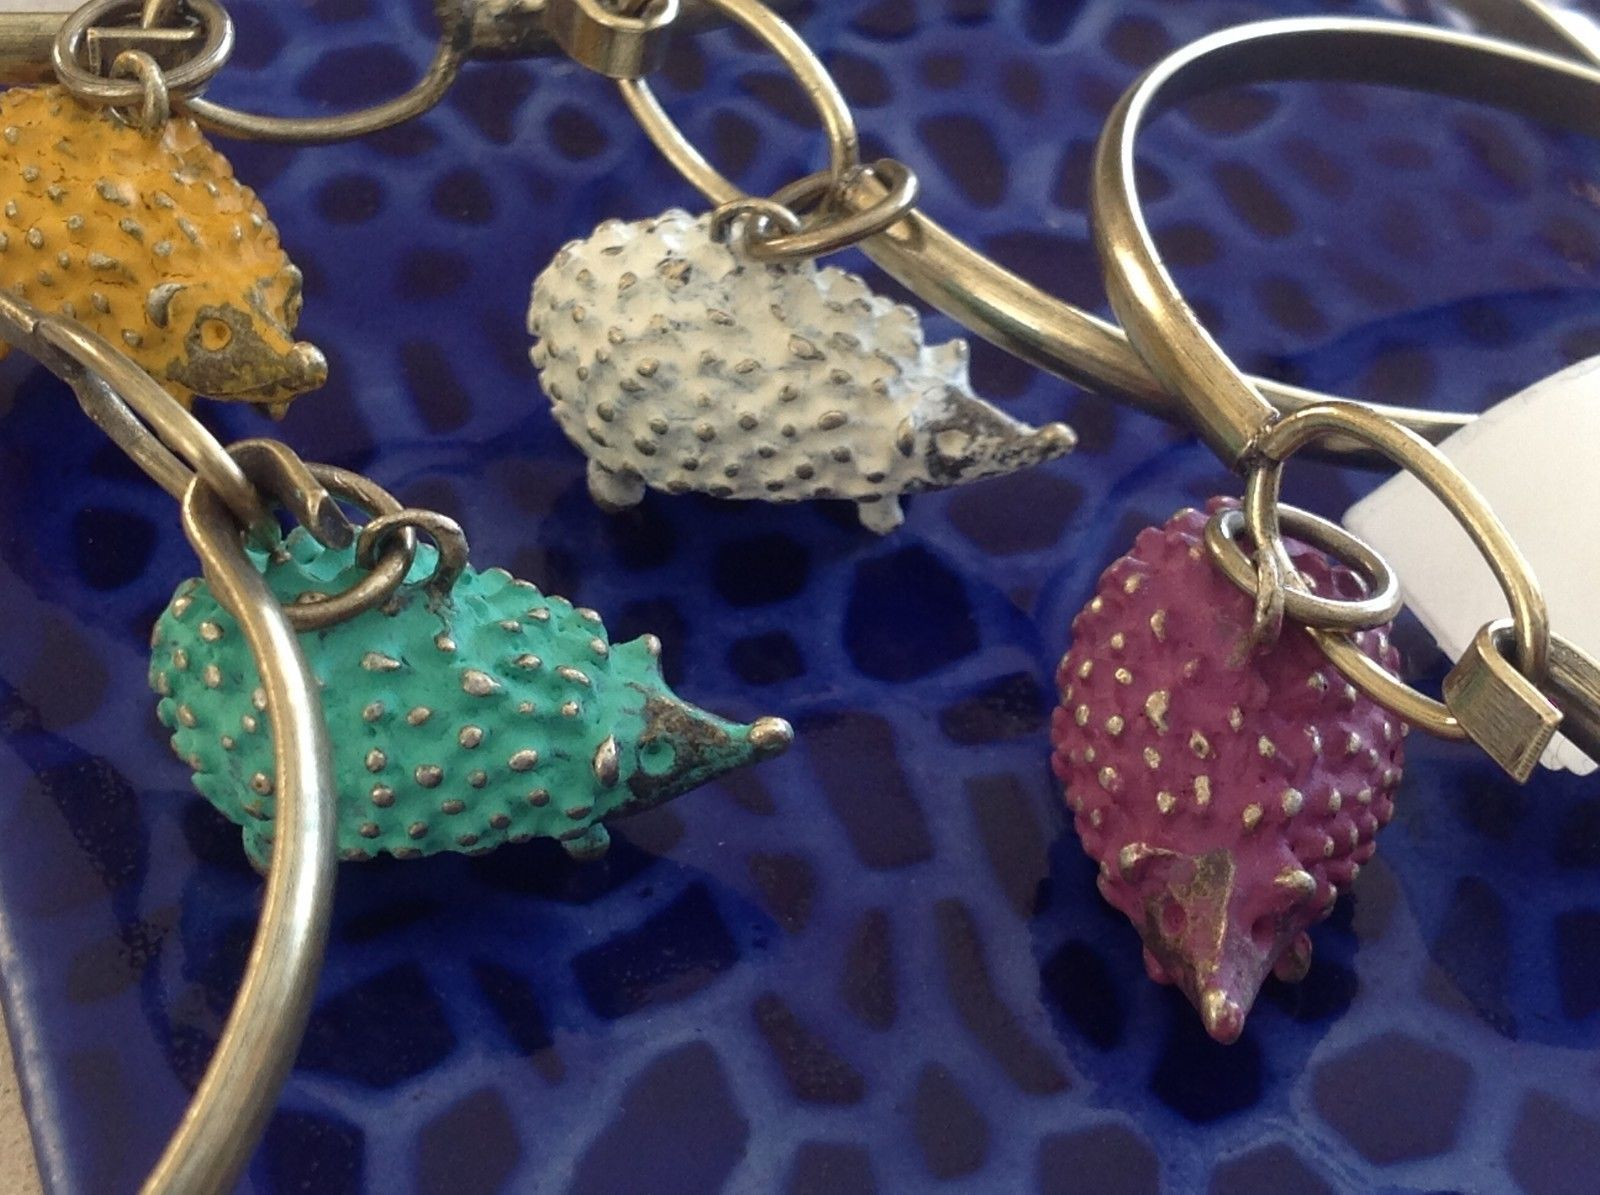 NEW bangle bracelet w Hedgehog Charm choice of color USA made